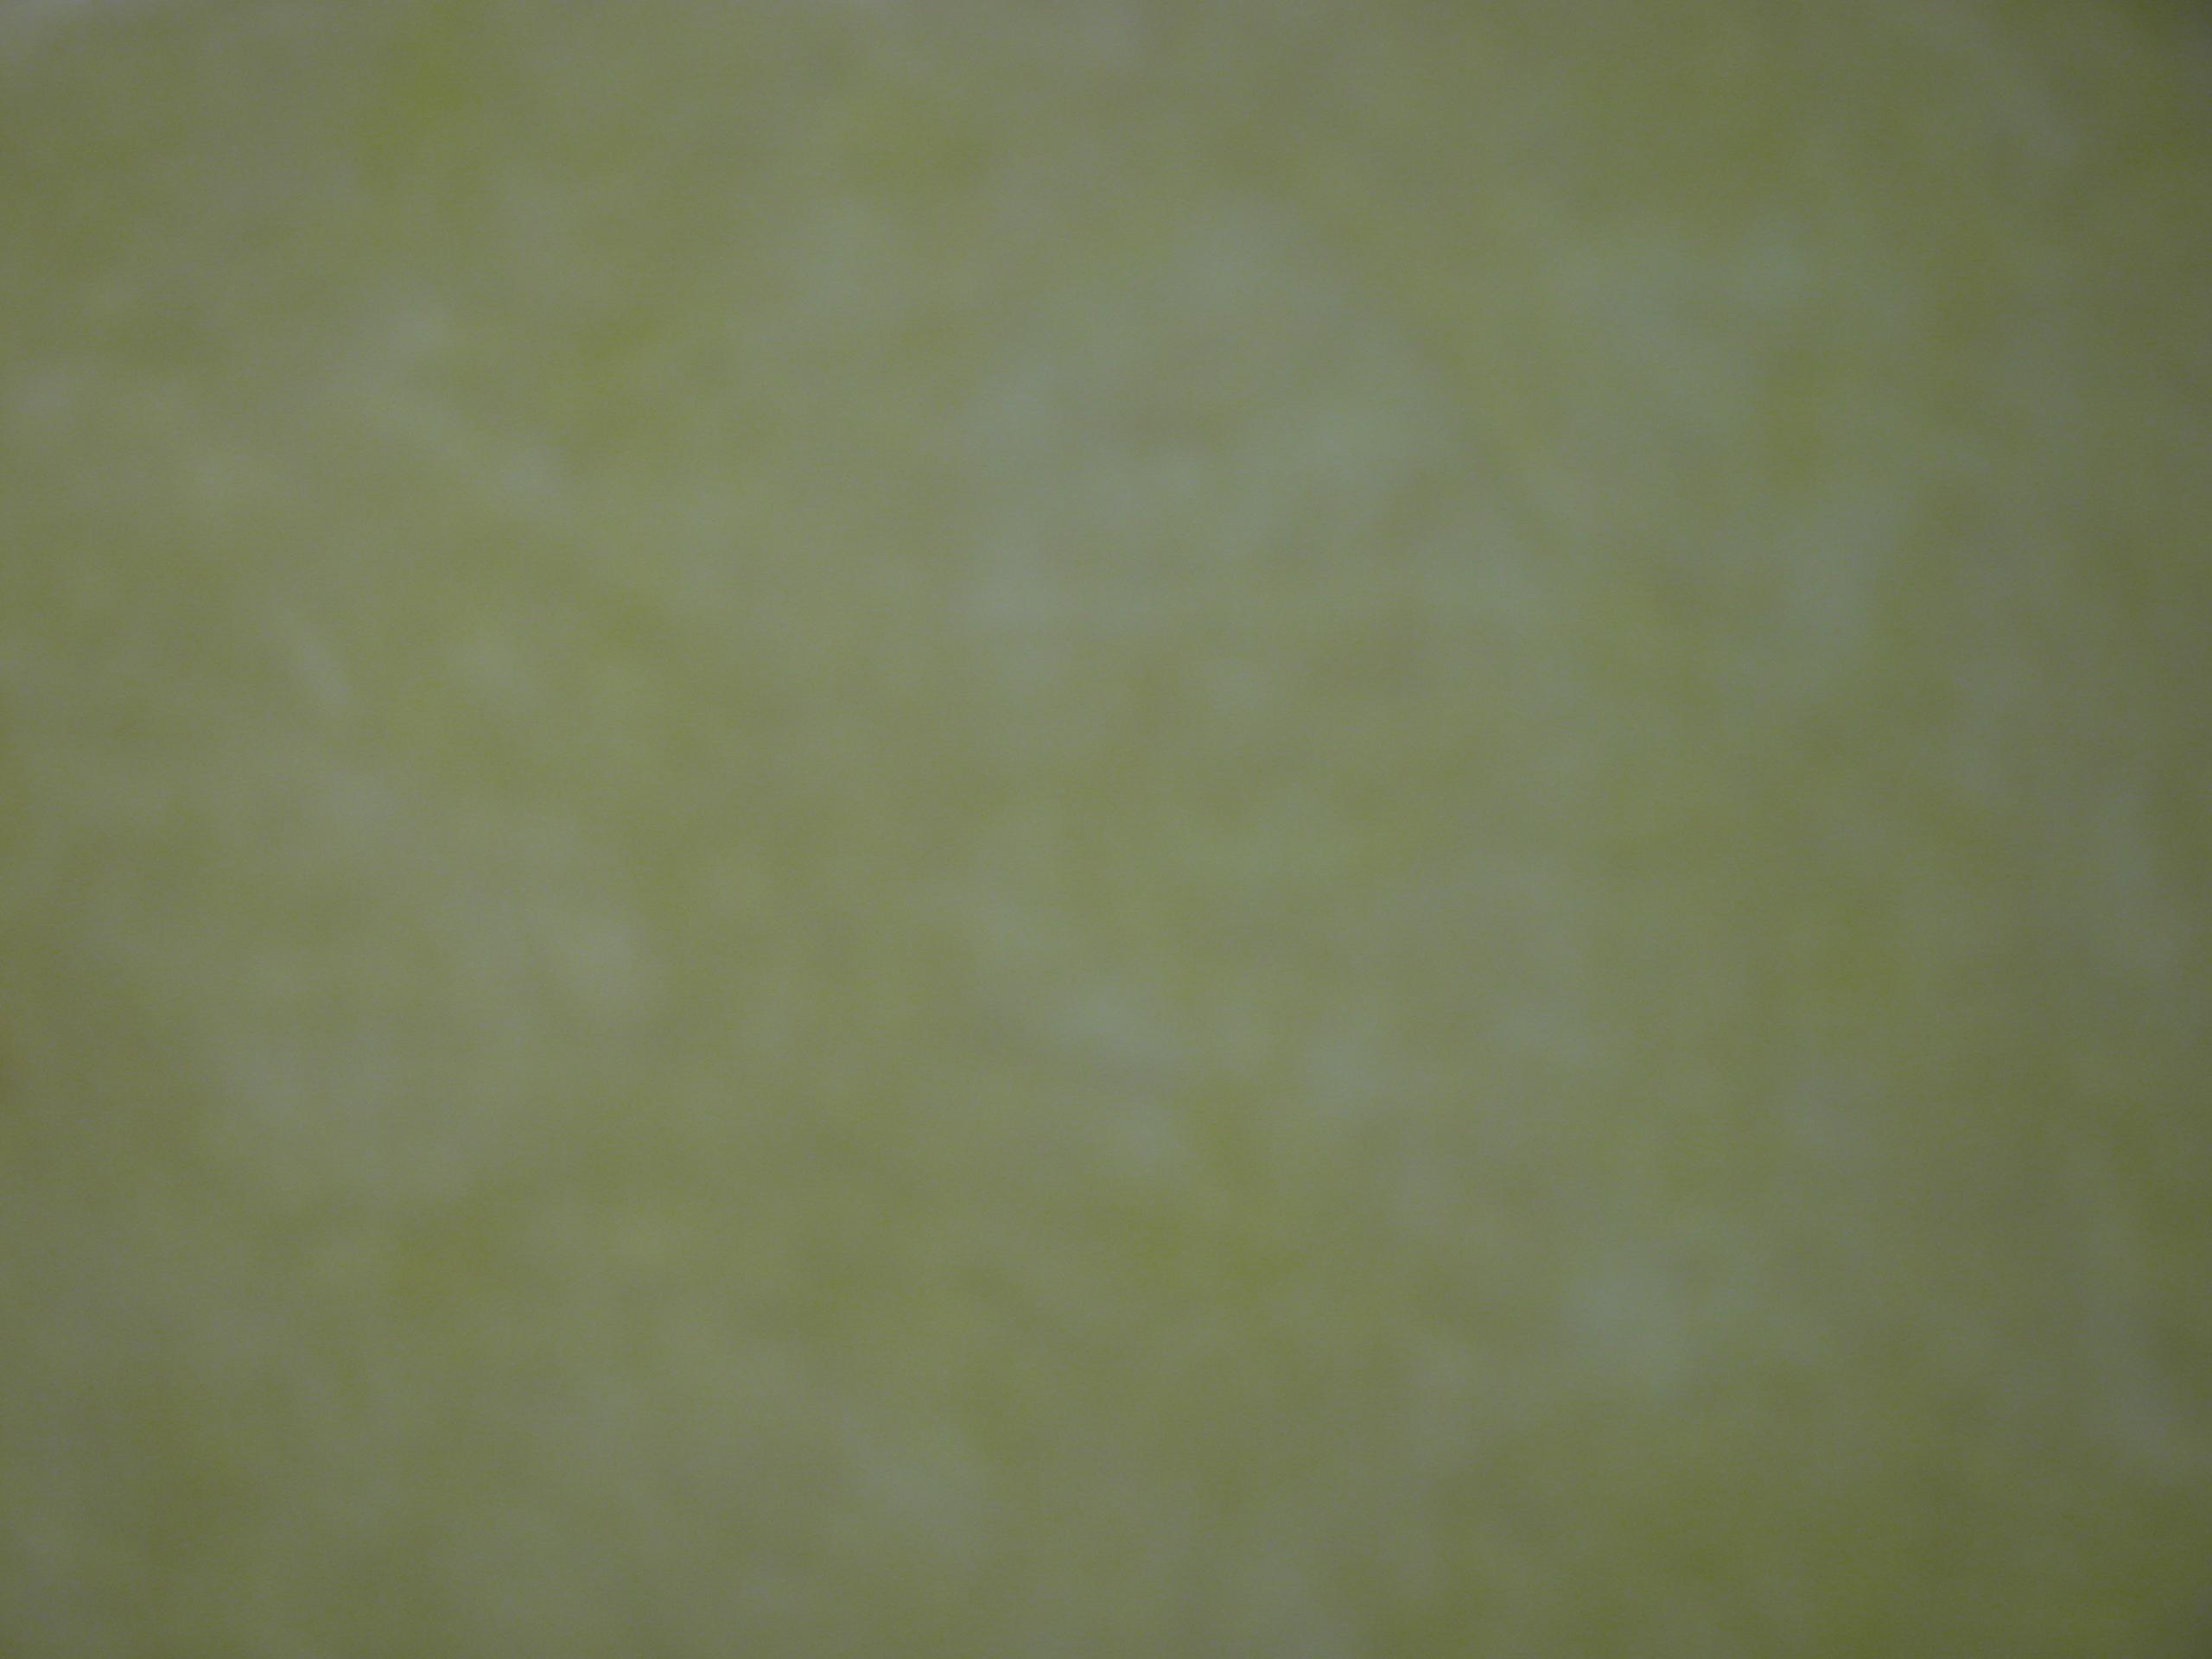 neymar psg jersey yellow